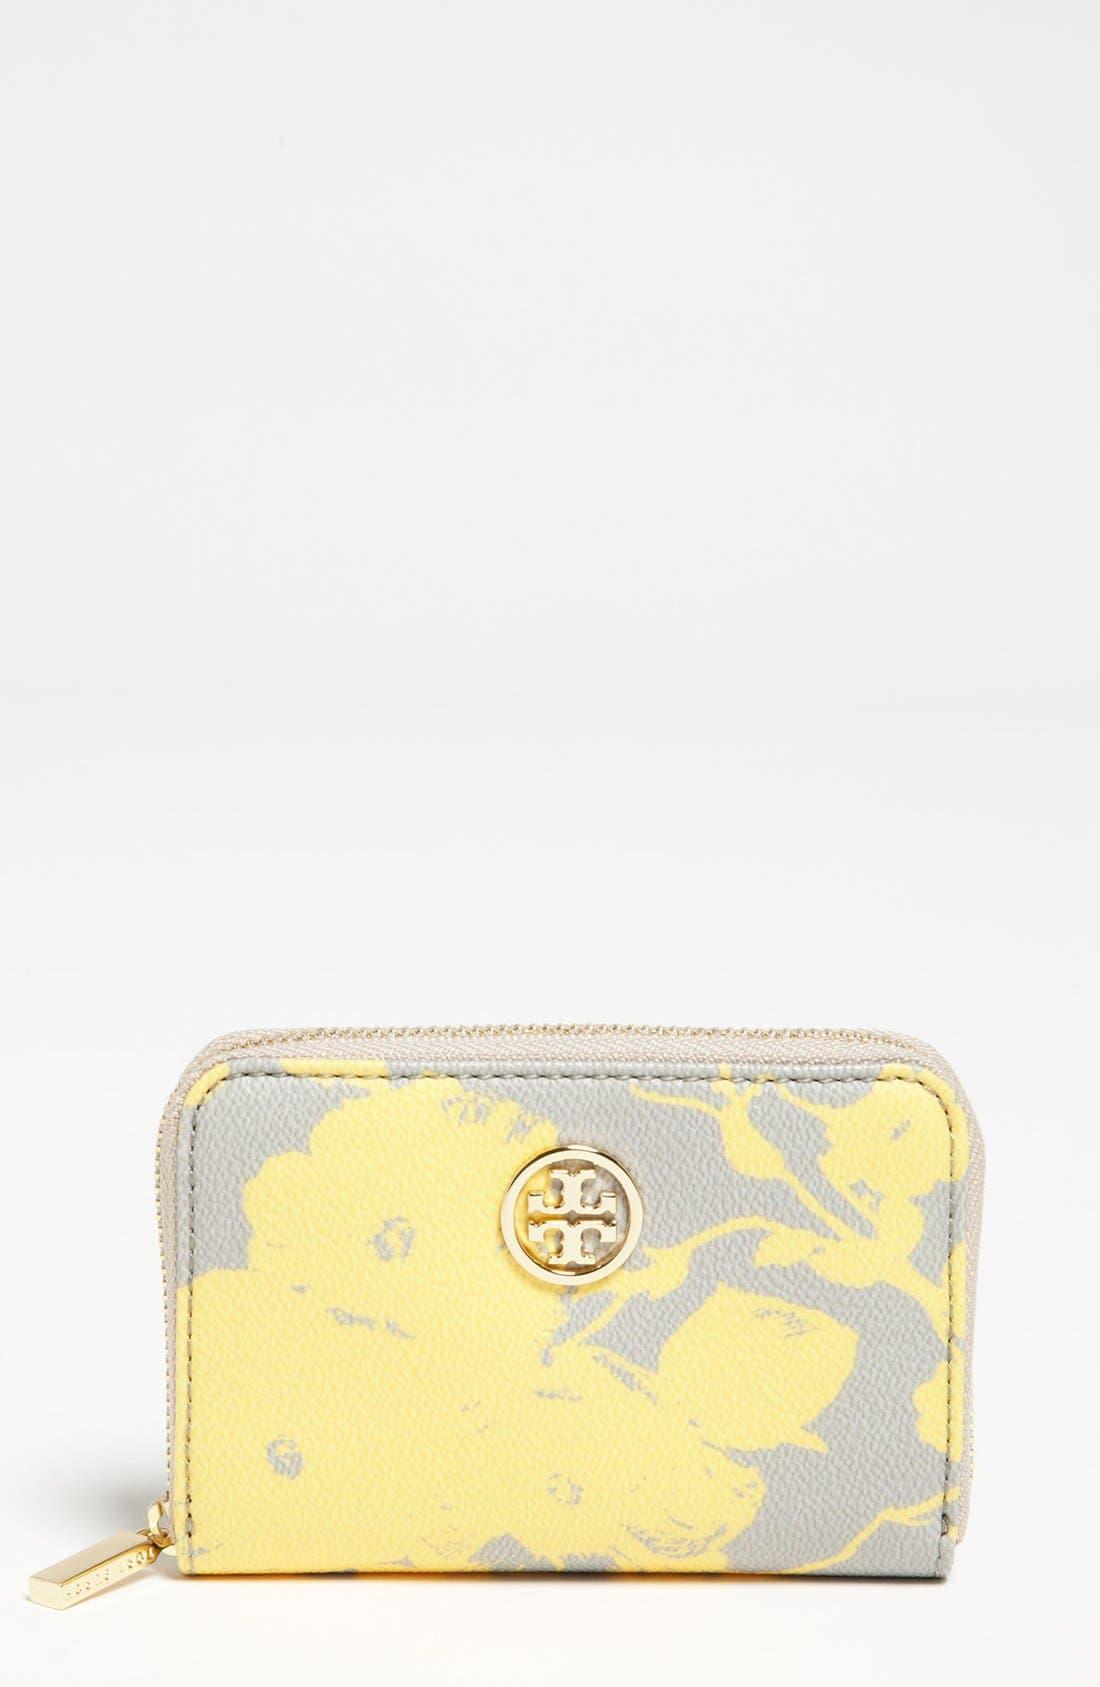 Main Image - Tory Burch 'Robinson' Coin Wallet